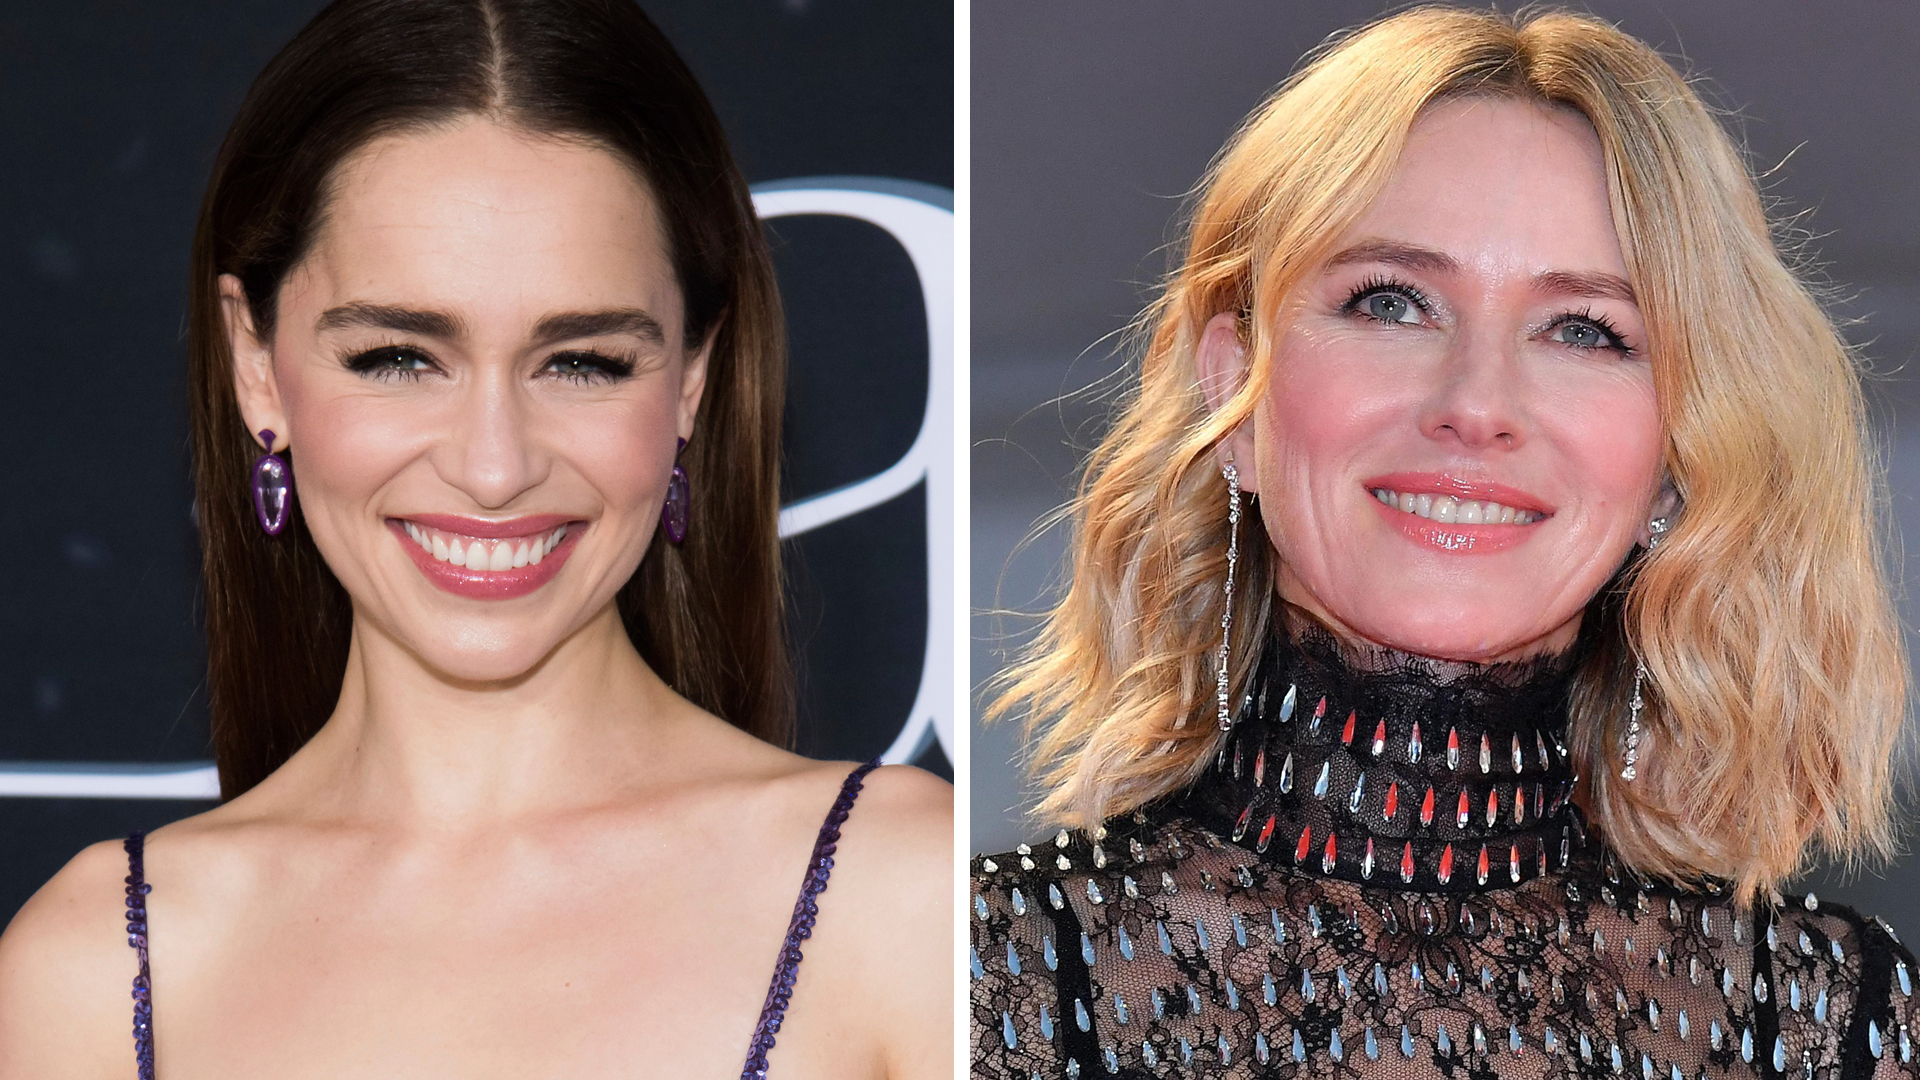 Reaparece Emilia Clarke para apoyar a Naomi Watts